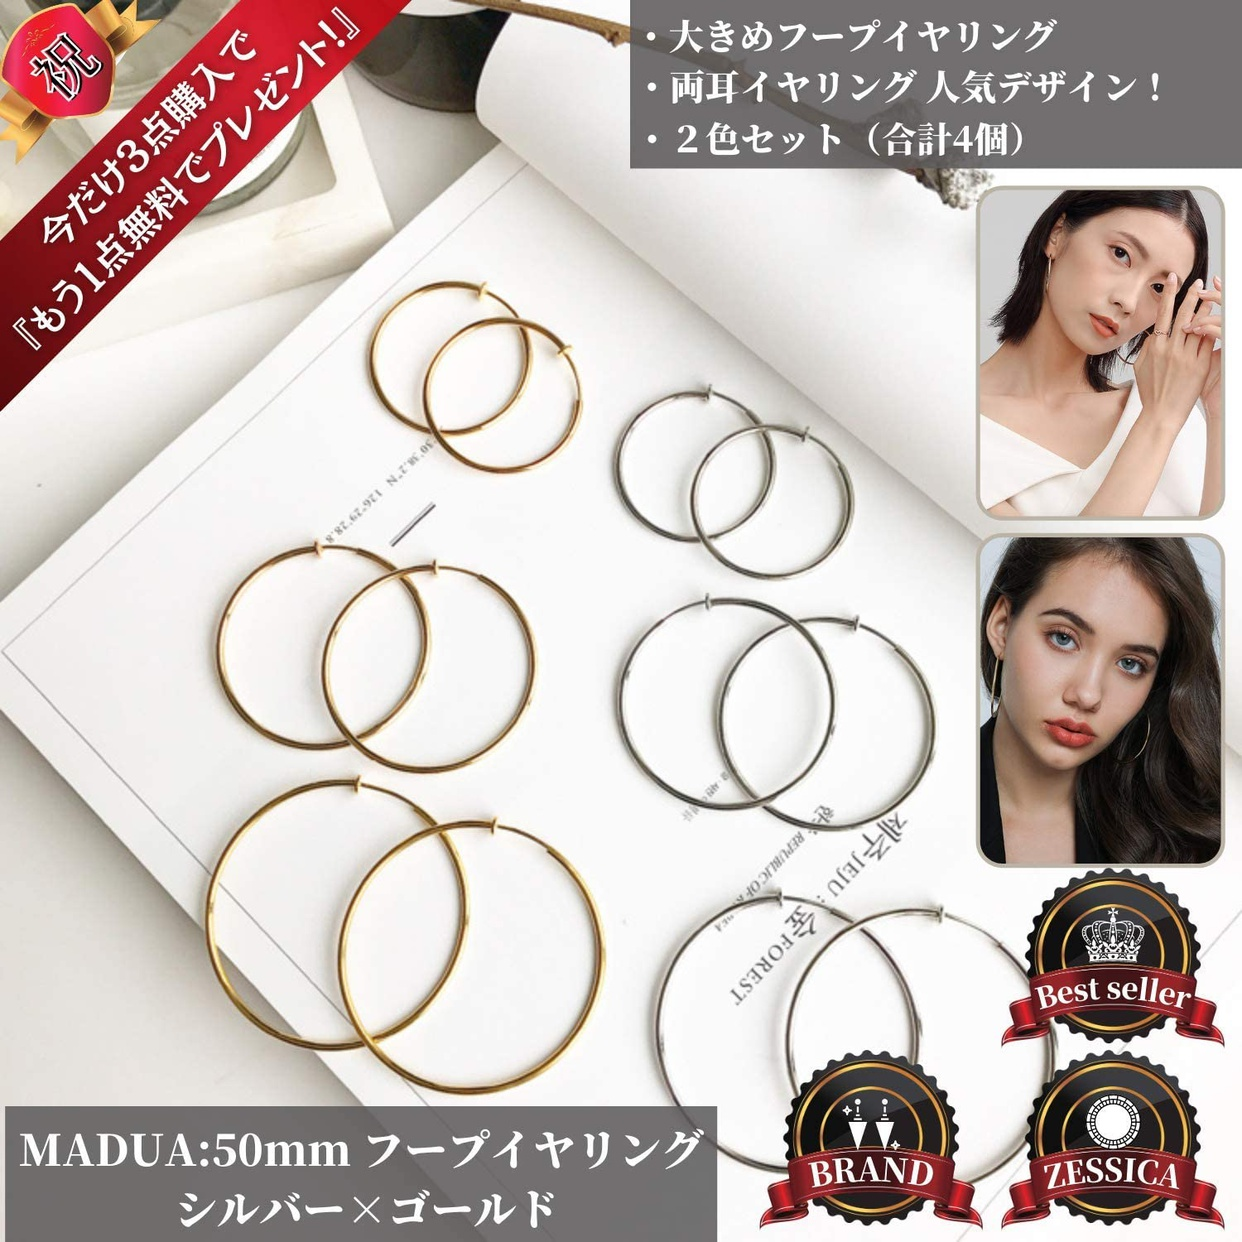 ZESSICA(ゼシカ) イヤリング マデュアシリーズの商品画像2